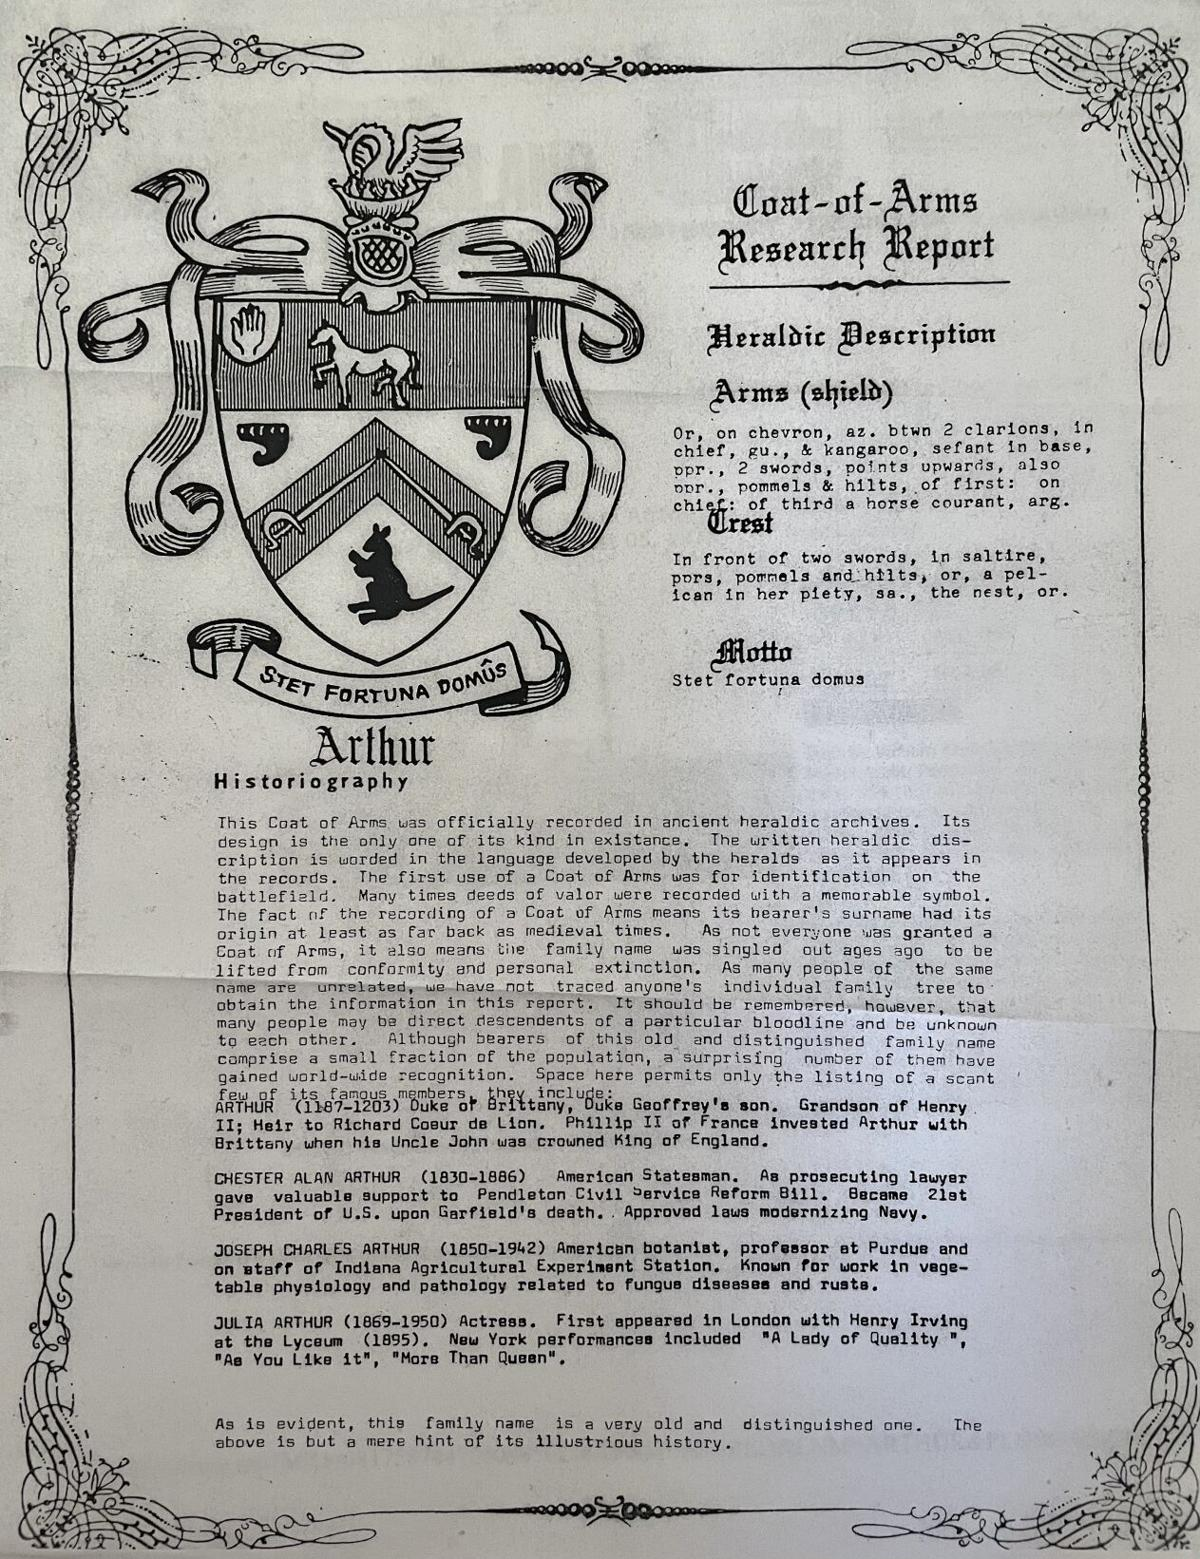 Arthur fam - Coat of Arms